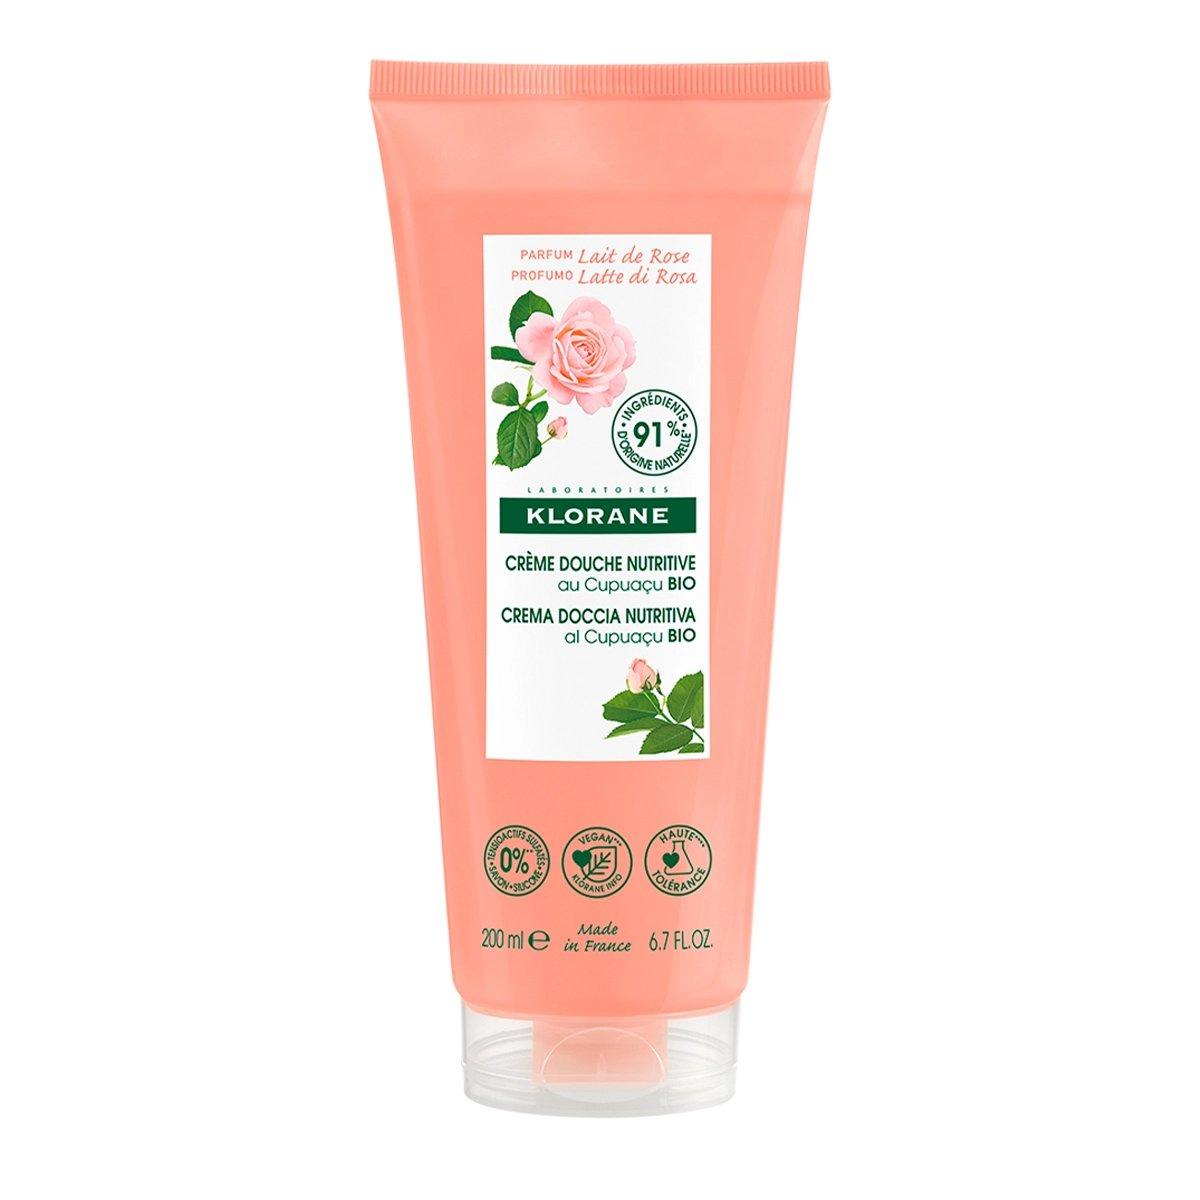 Klorane Nourishing Shower Cream Θρεπτικό Κρεμώδες Ντους με Έλαιο Τριαντάφυλλο & Βιολογικό Βούτυρο Cupuacu 200ml